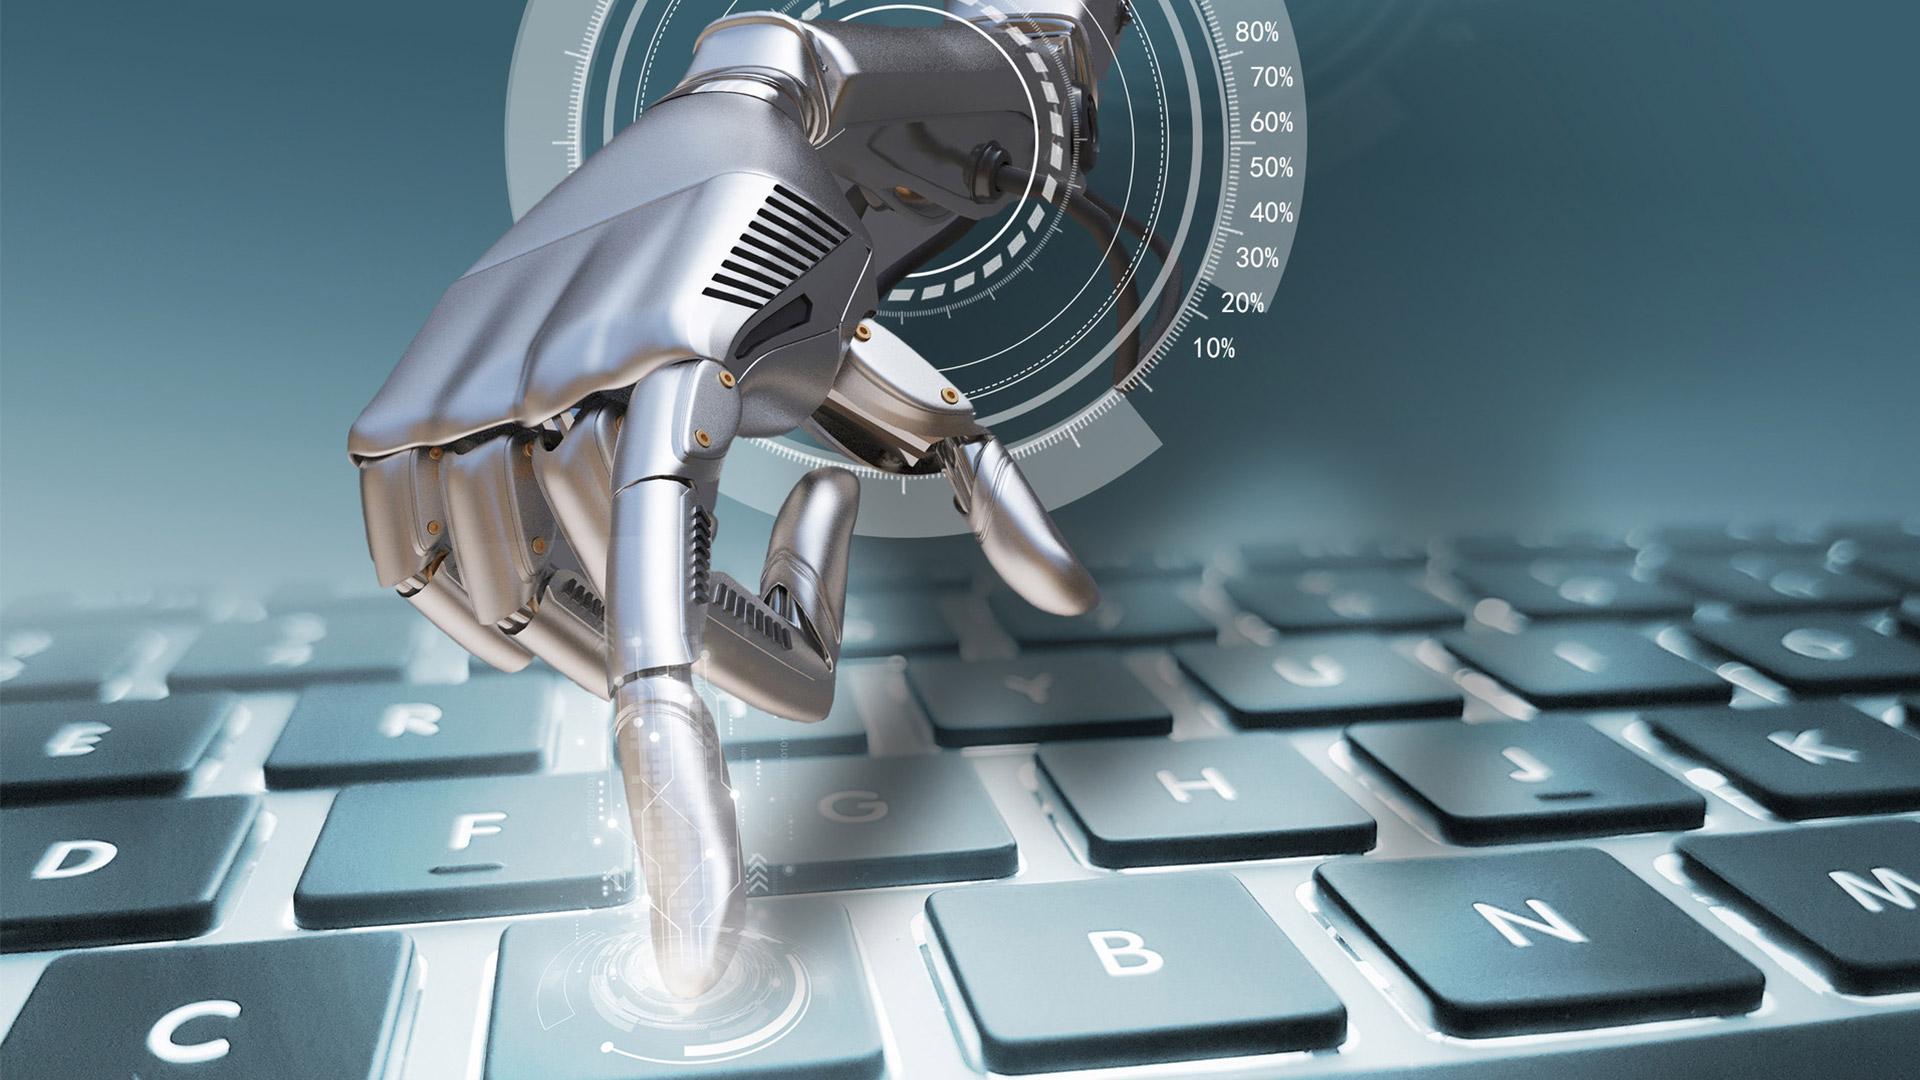 Intelligent Robot